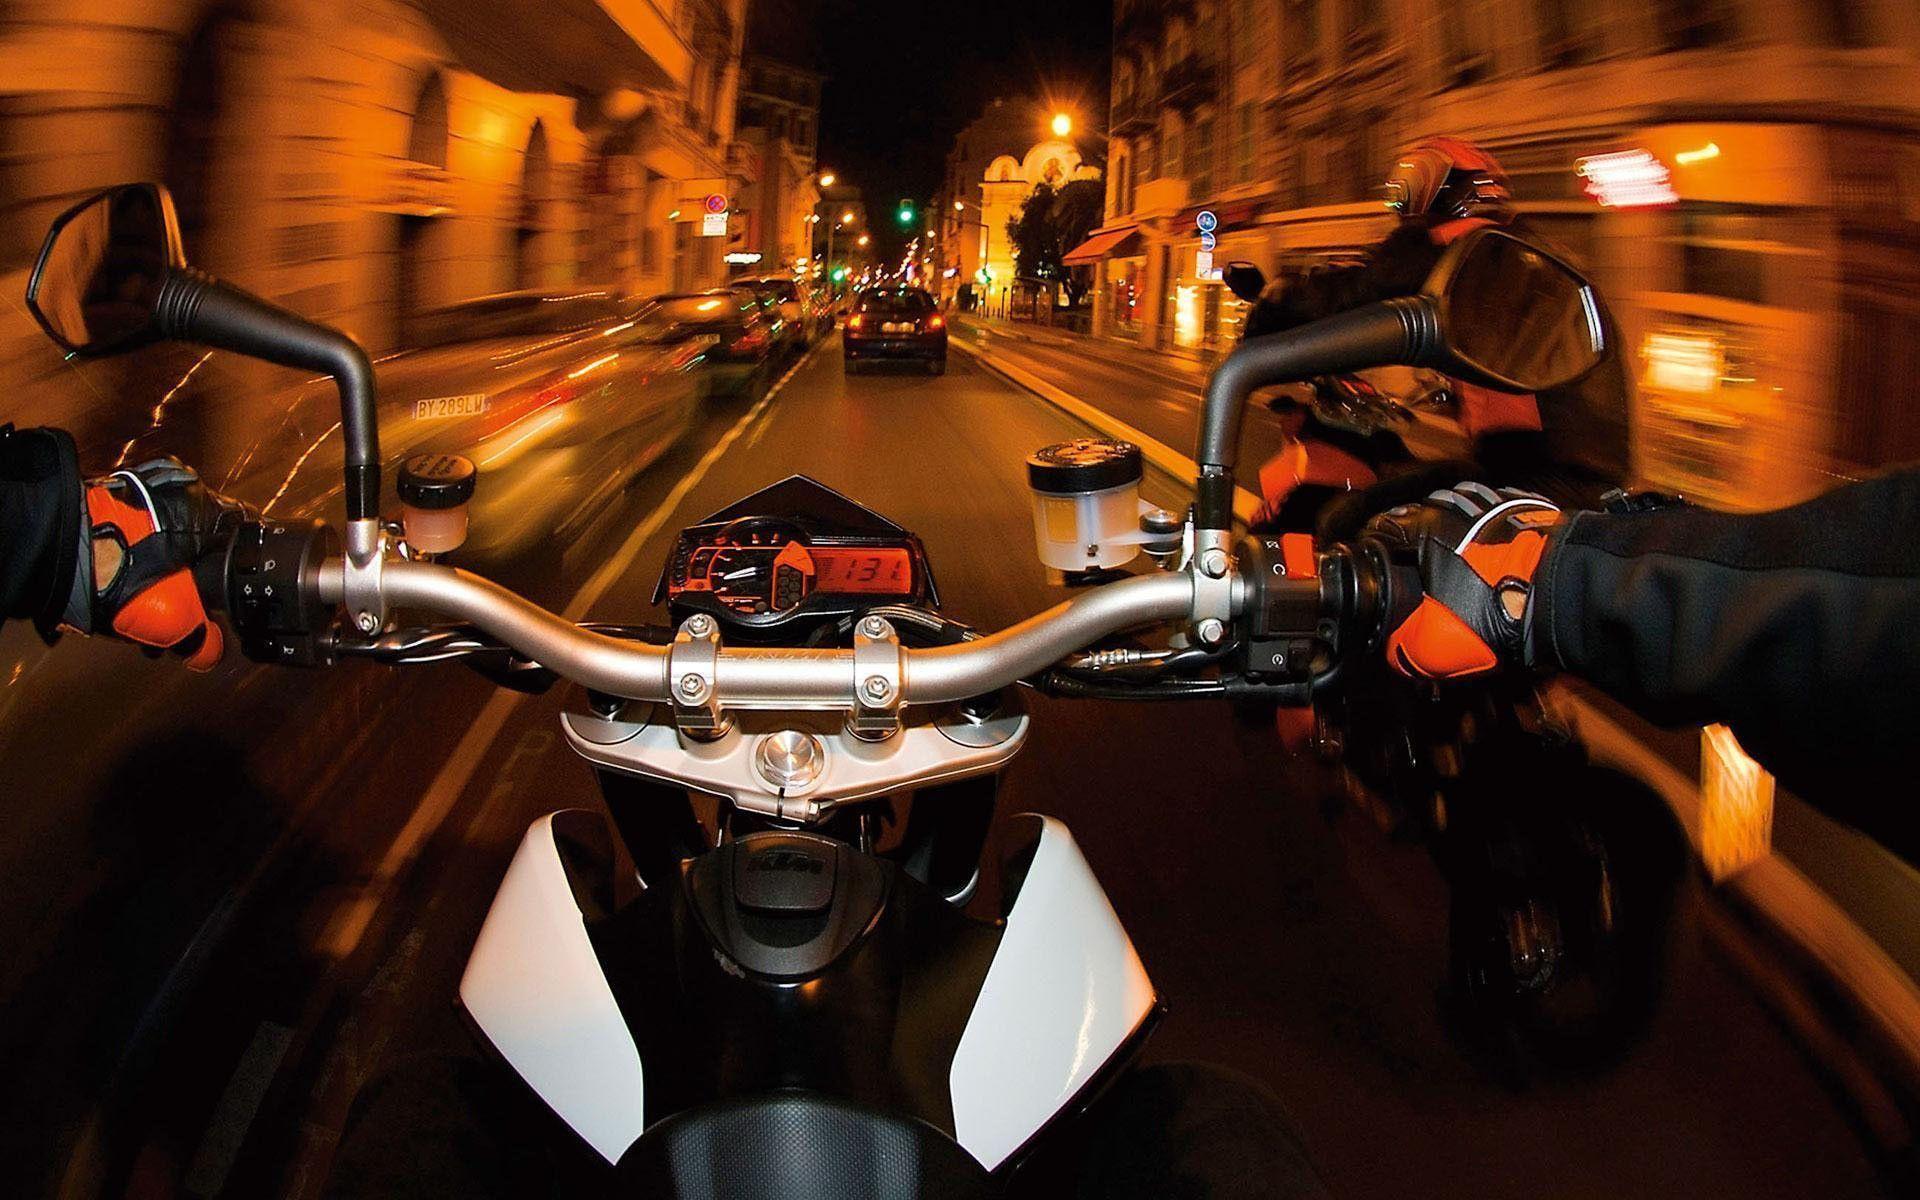 KTM Speeding wallpapers | KTM Speeding stock photos